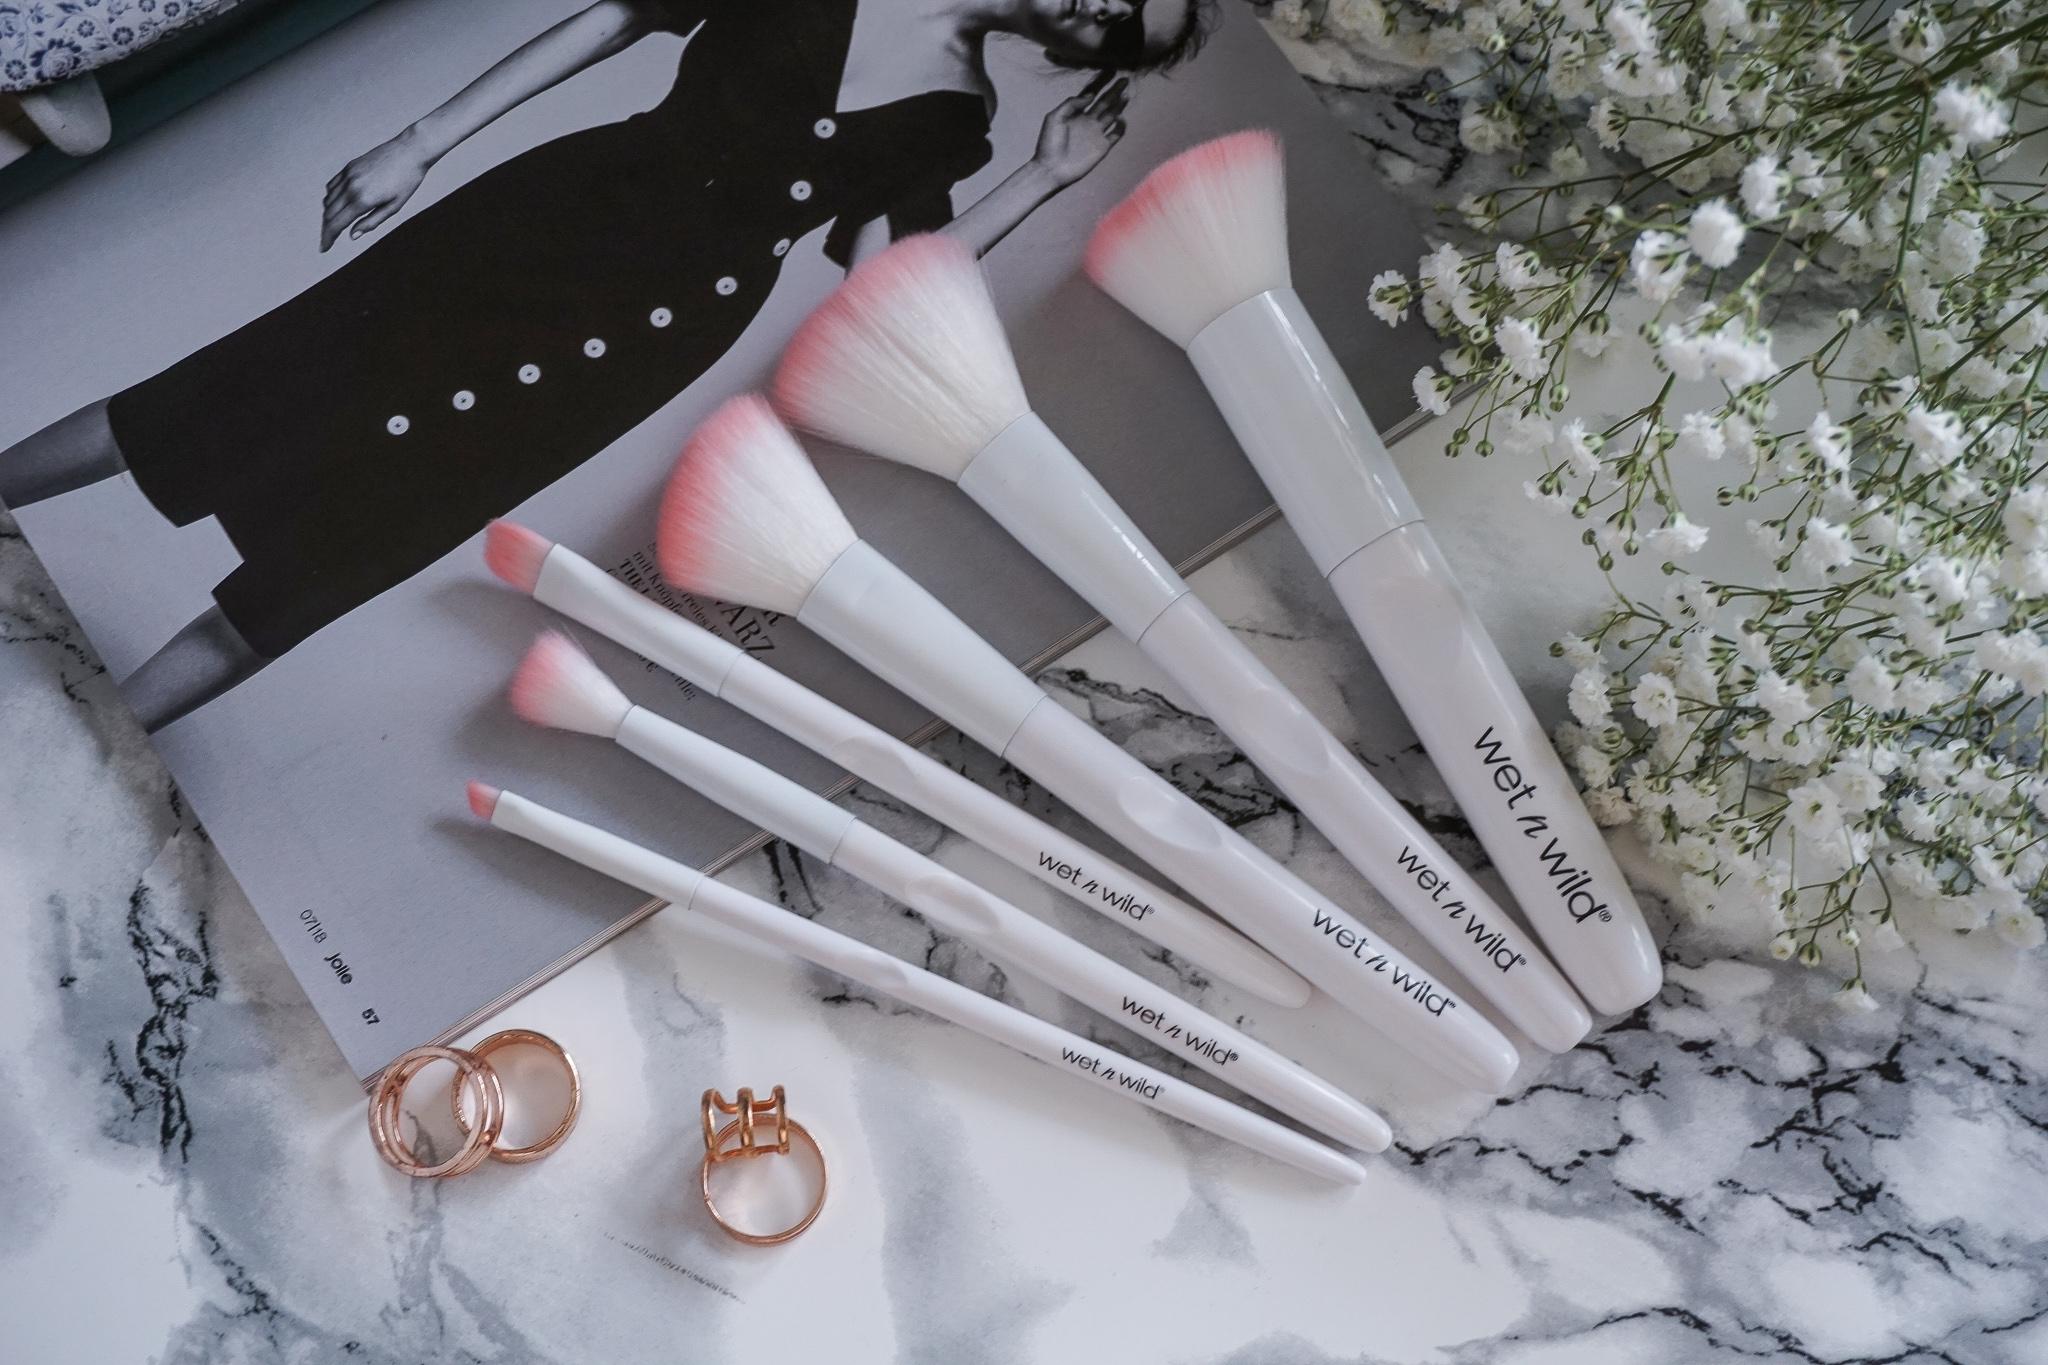 Wetnwild brushes makeup